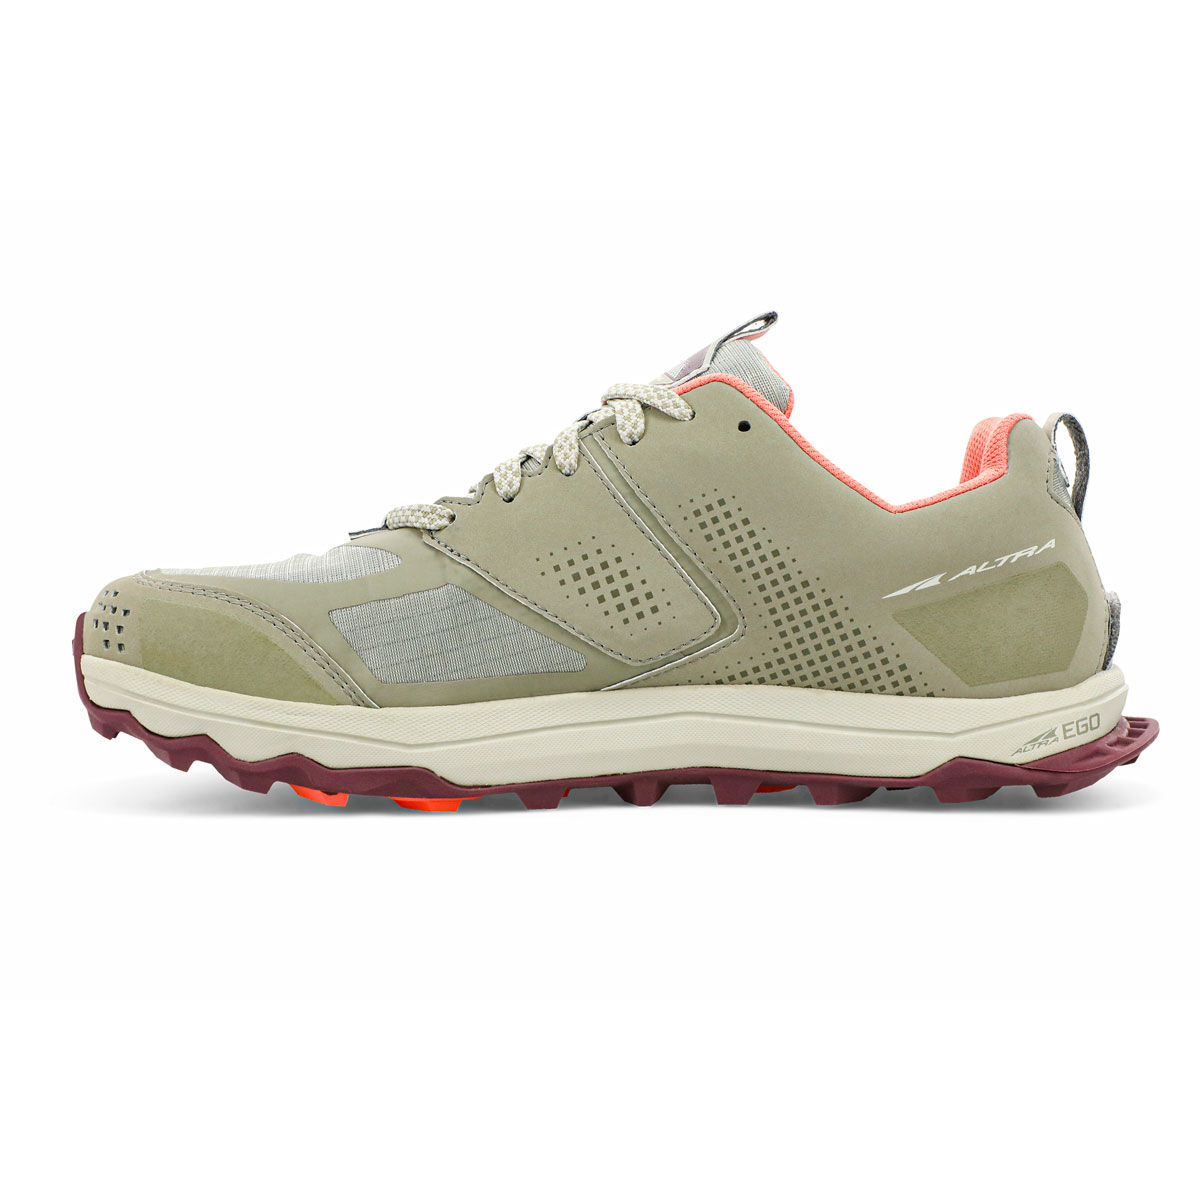 Women's Altra Lone Peak 5 Trail Running Shoe - Color: Khaki - Size: 5.5 - Width: Regular, Khaki, large, image 2